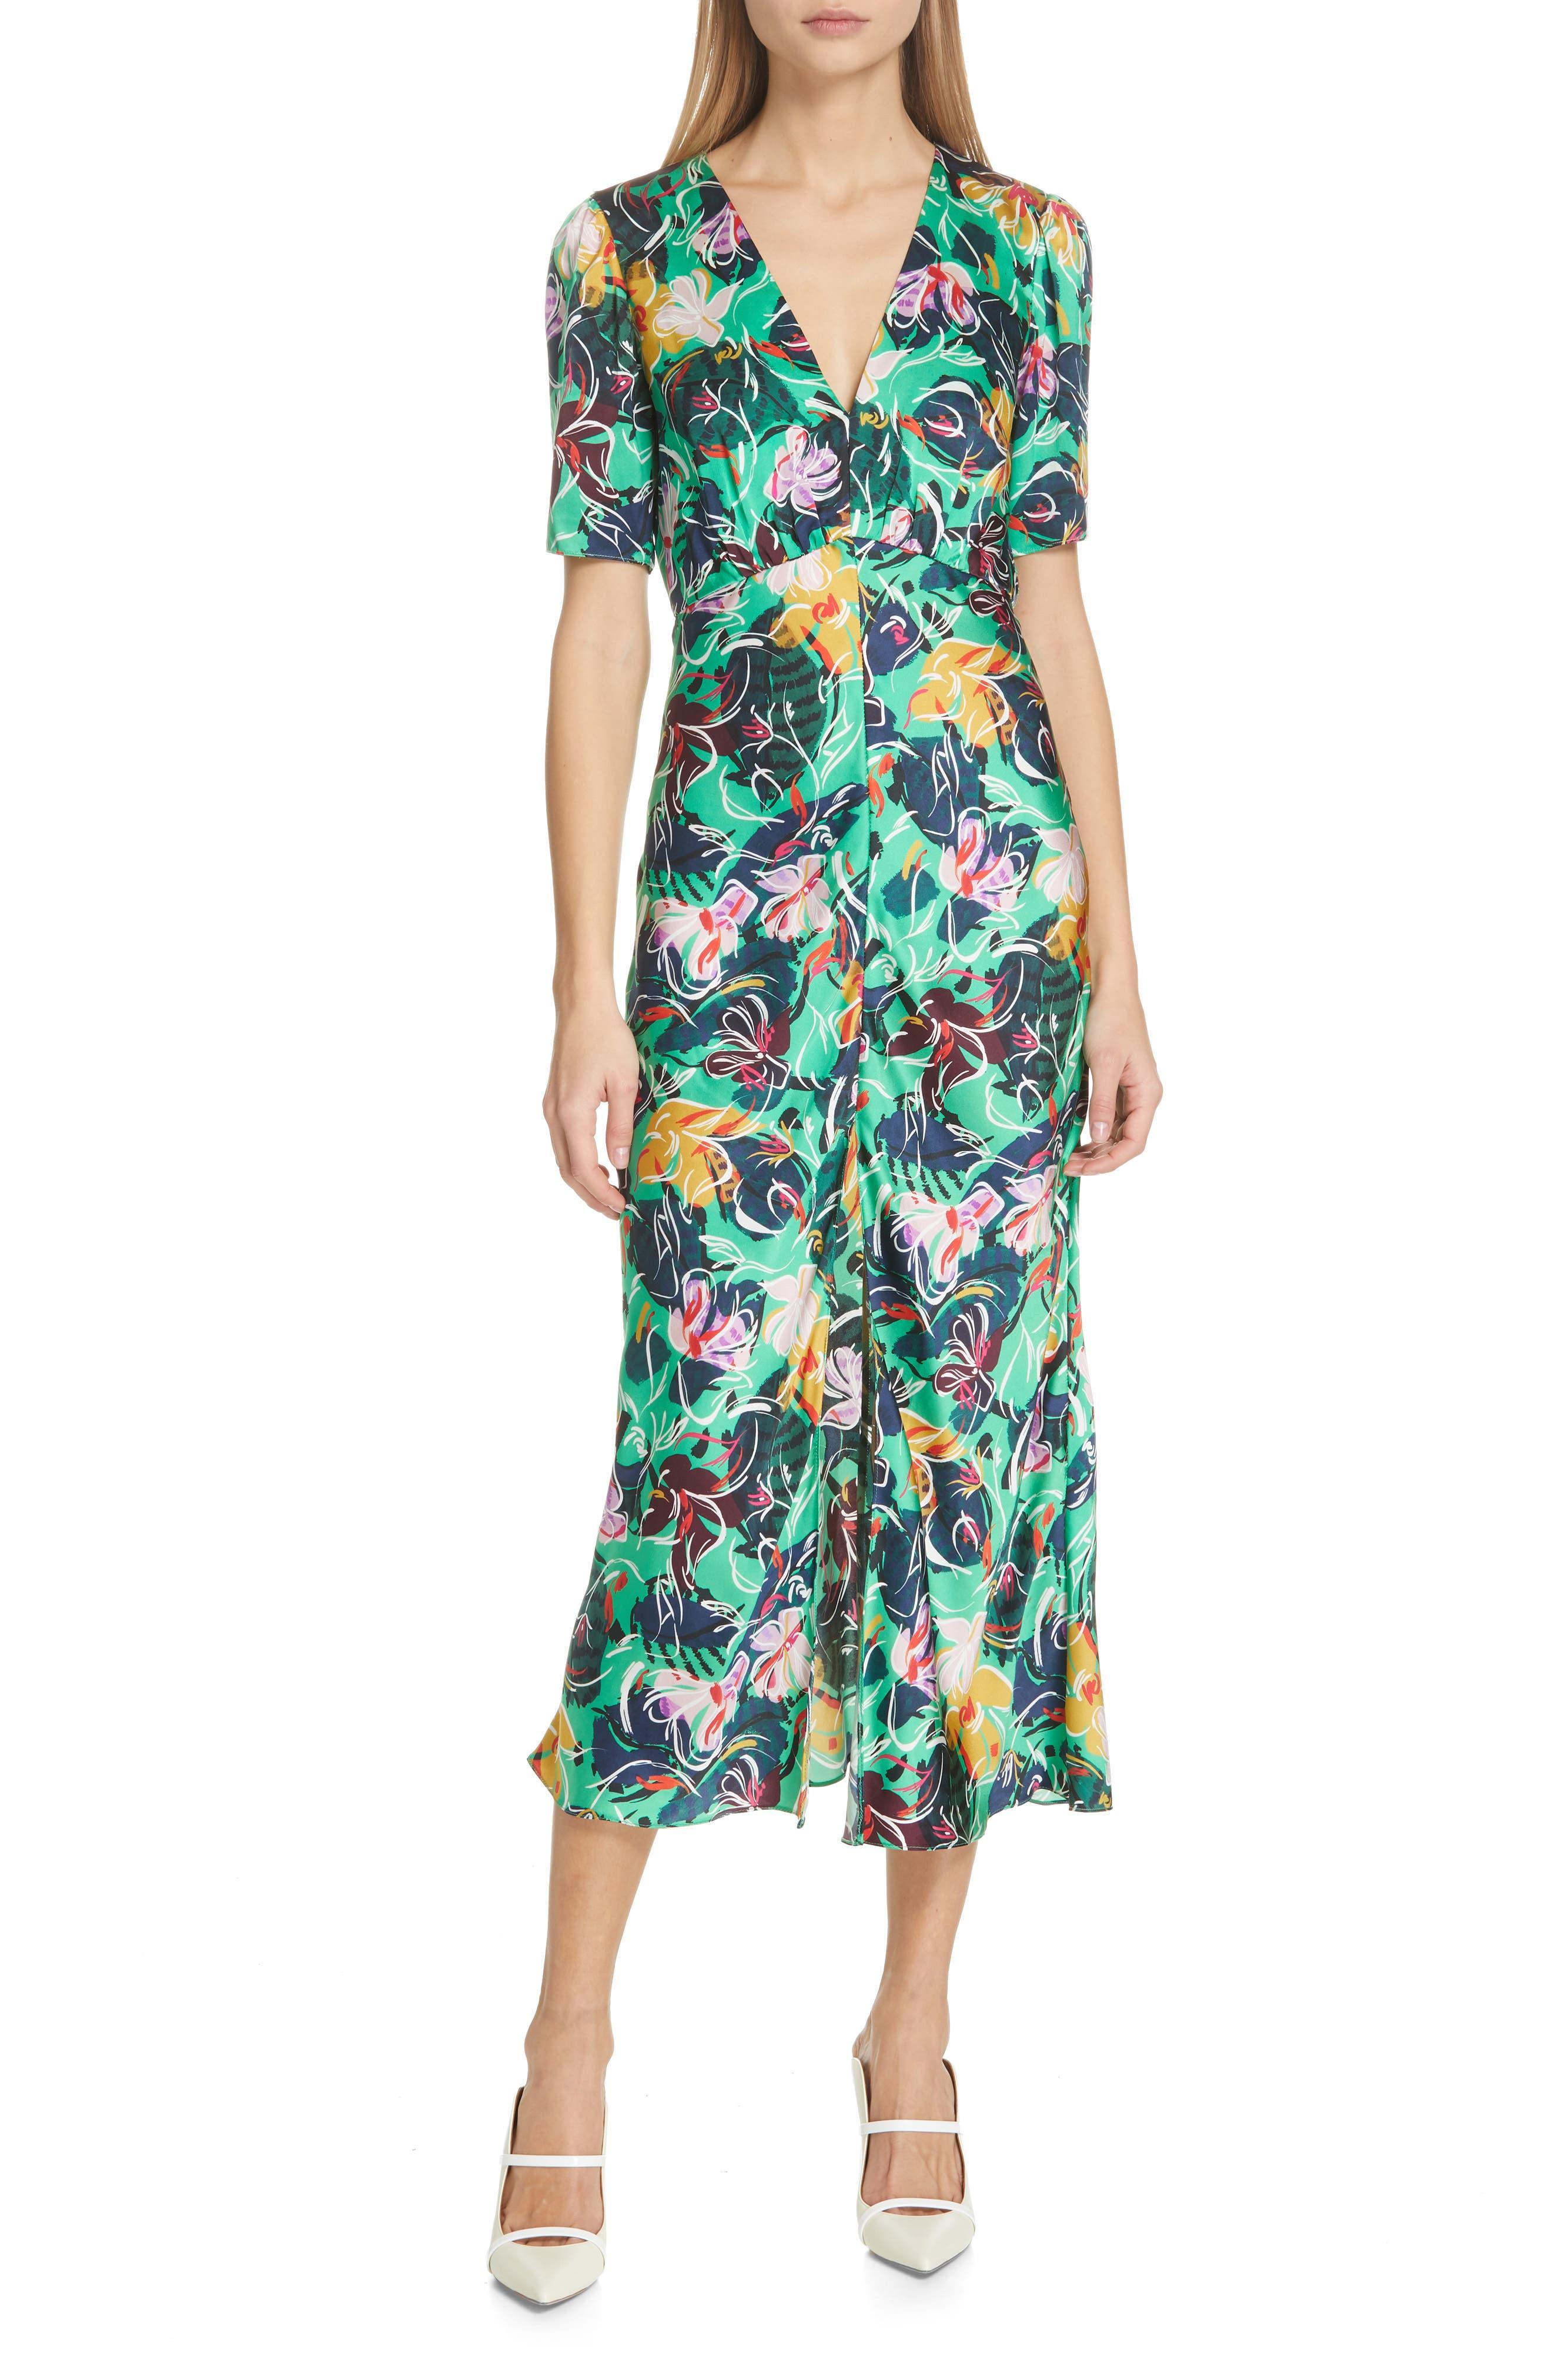 SALONI, Eden Floral Print Silk Midi Dress, Main thumbnail 1, color, EMERALD KINGCUP